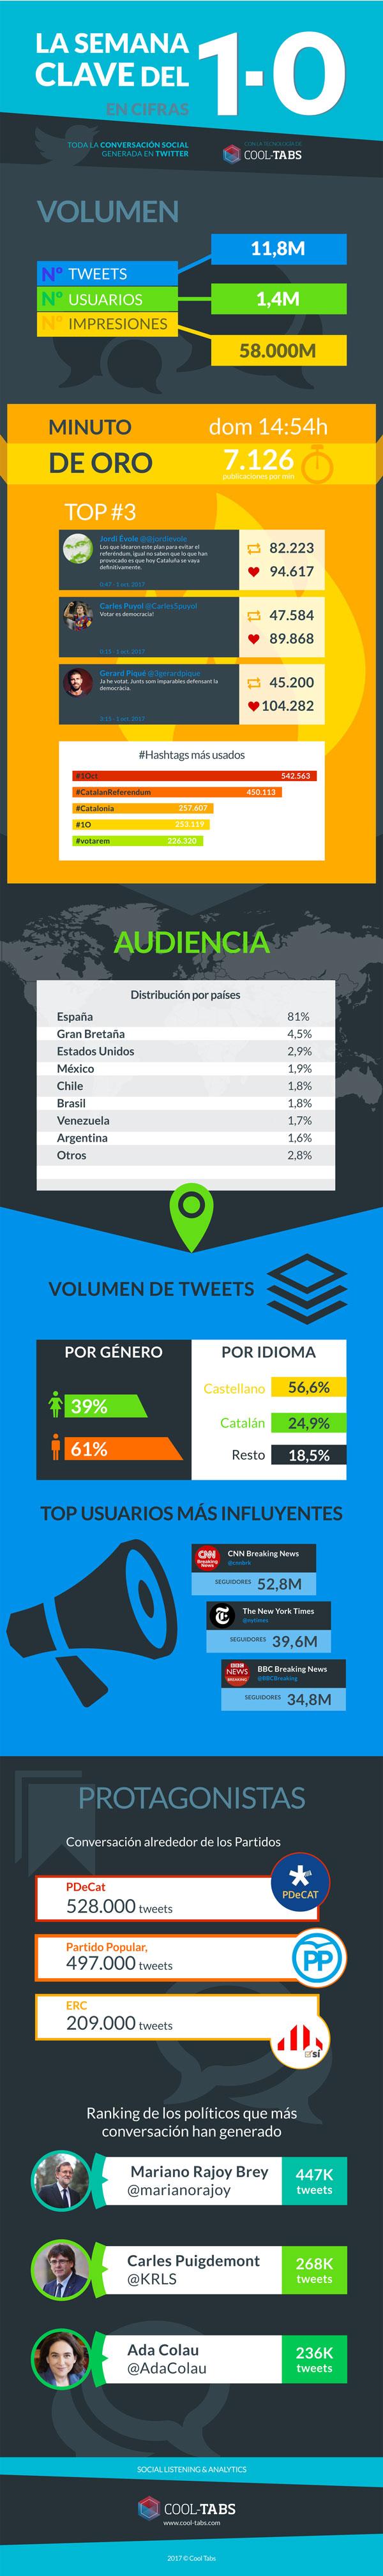 infografía-referéndum-cataluña